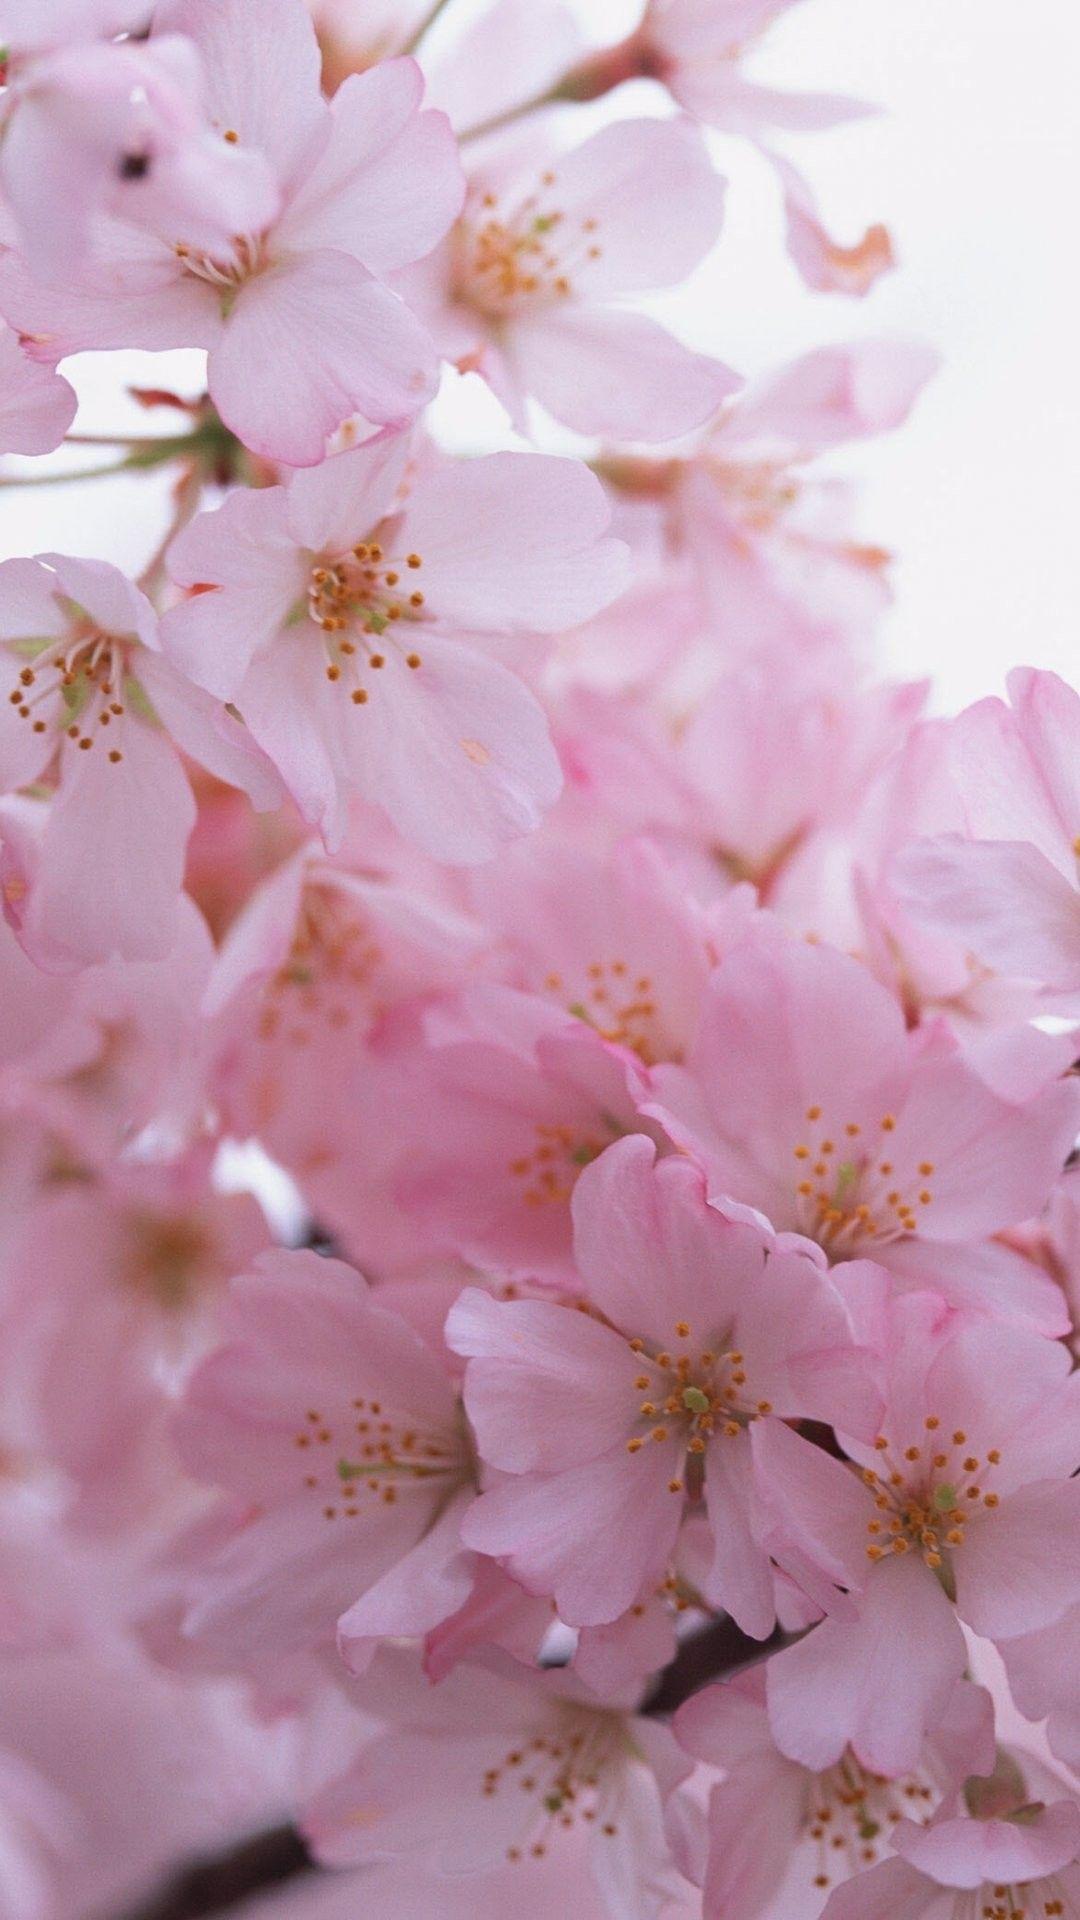 Iphone 6 wallpaper tumblr flower - Sakura Iphone 6 Plus Wallpaper 20971 Flowers Iphone 6 Plus Wallpapers